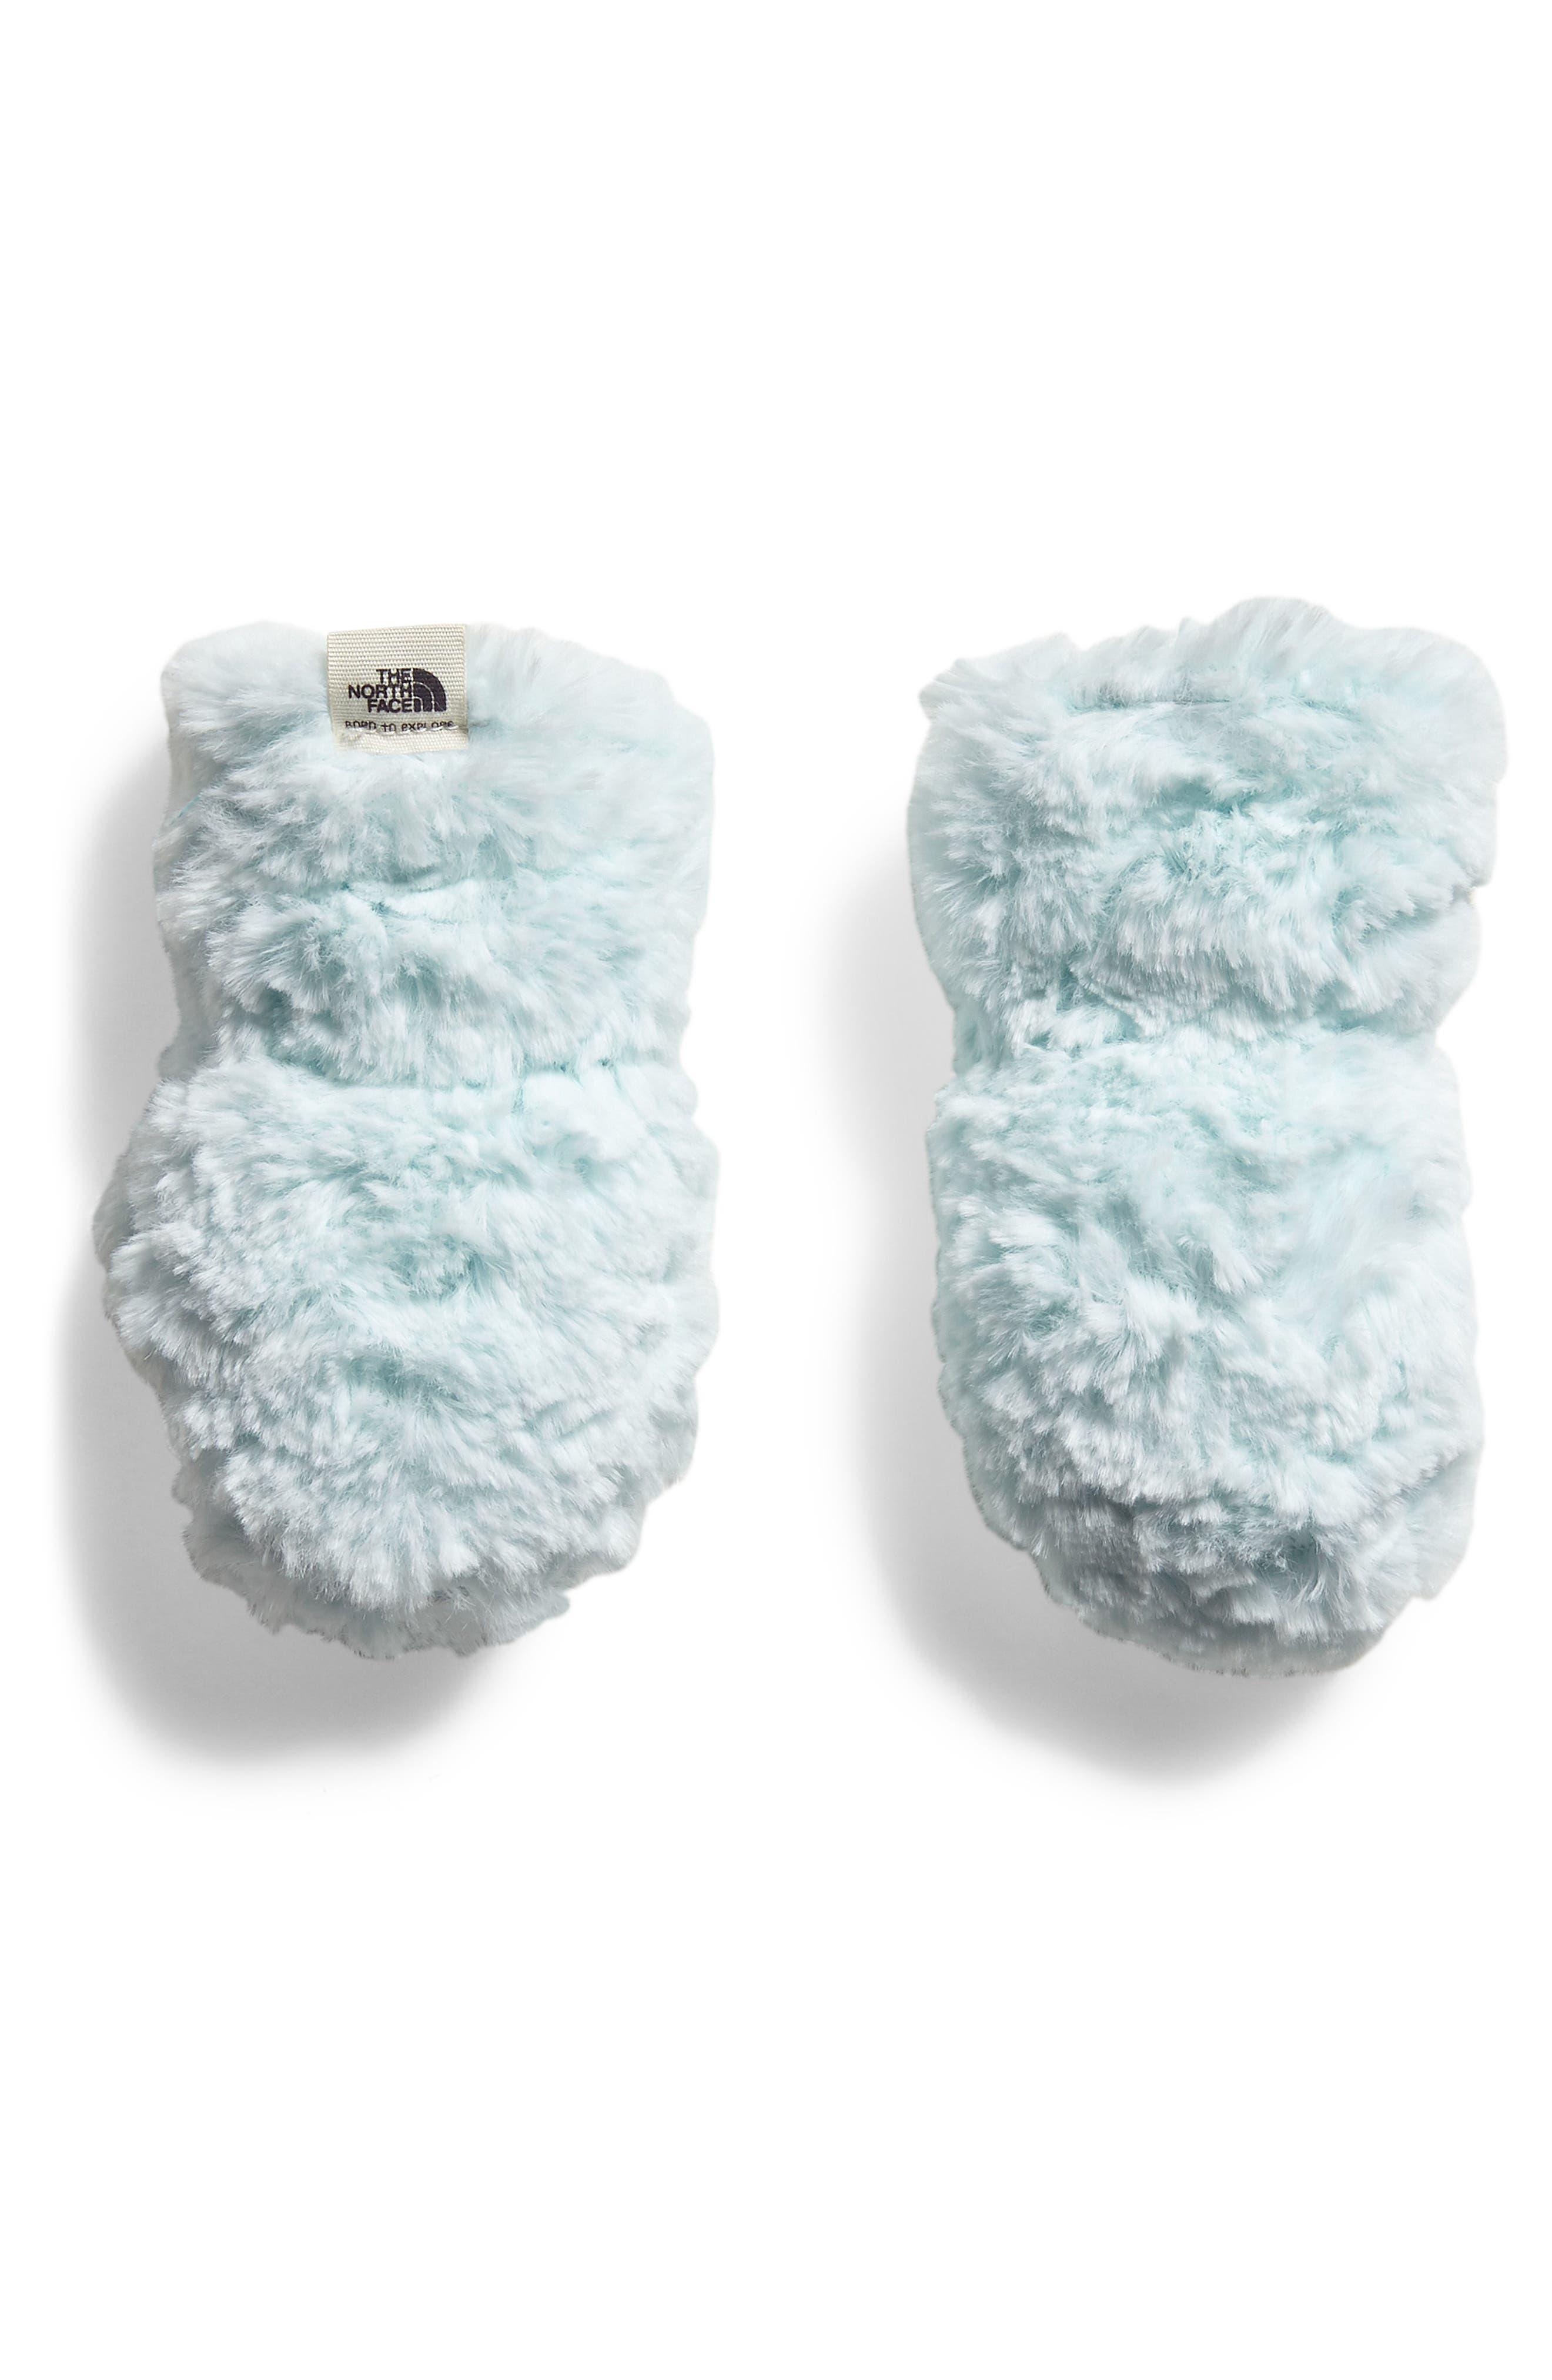 Mossbud Swirl Reversible Water Resistant Heatseeker<sup>™</sup> Insulated Mittens,                             Alternate thumbnail 2, color,                             MINT BLUE/ ORIGIN BLUE